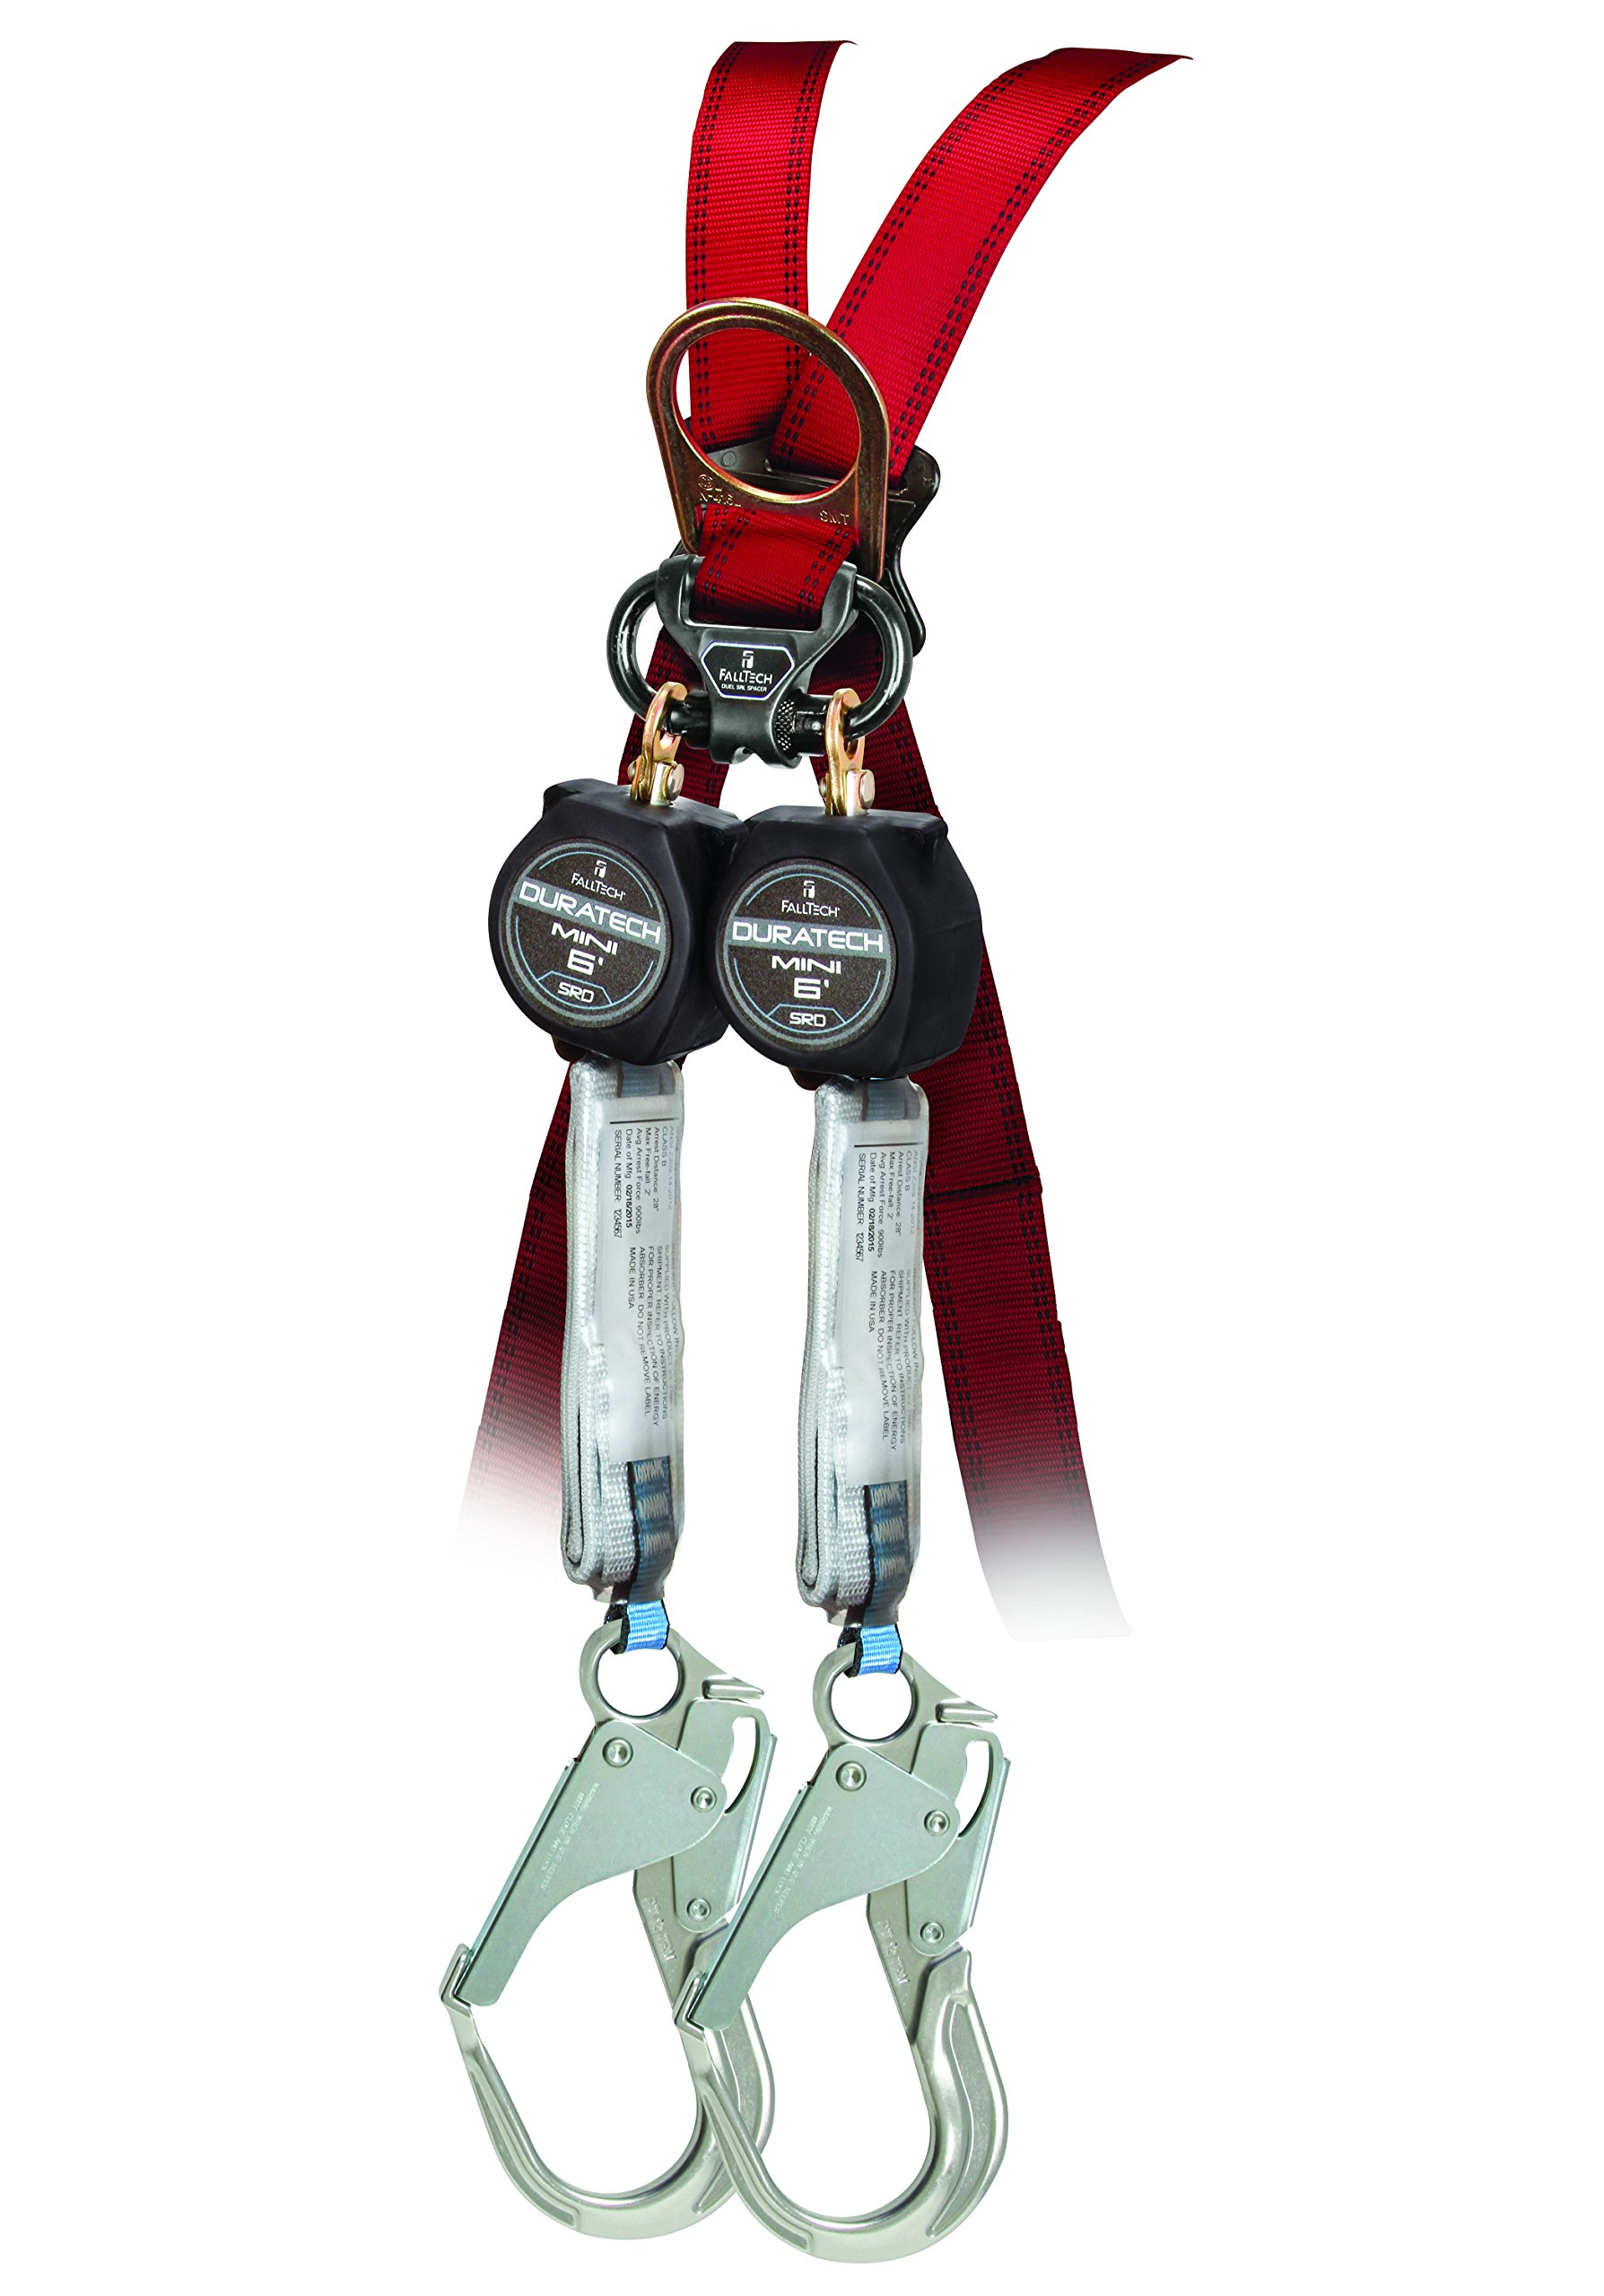 FallTech 72706TB5 MINI DuraTech 6' Compact Web SRL - 6' Mini SRD Twin-Leg Carabiner with Alignment Clip and Aluminum Rebar Hooks, 6', Black by FallTech (Image #1)